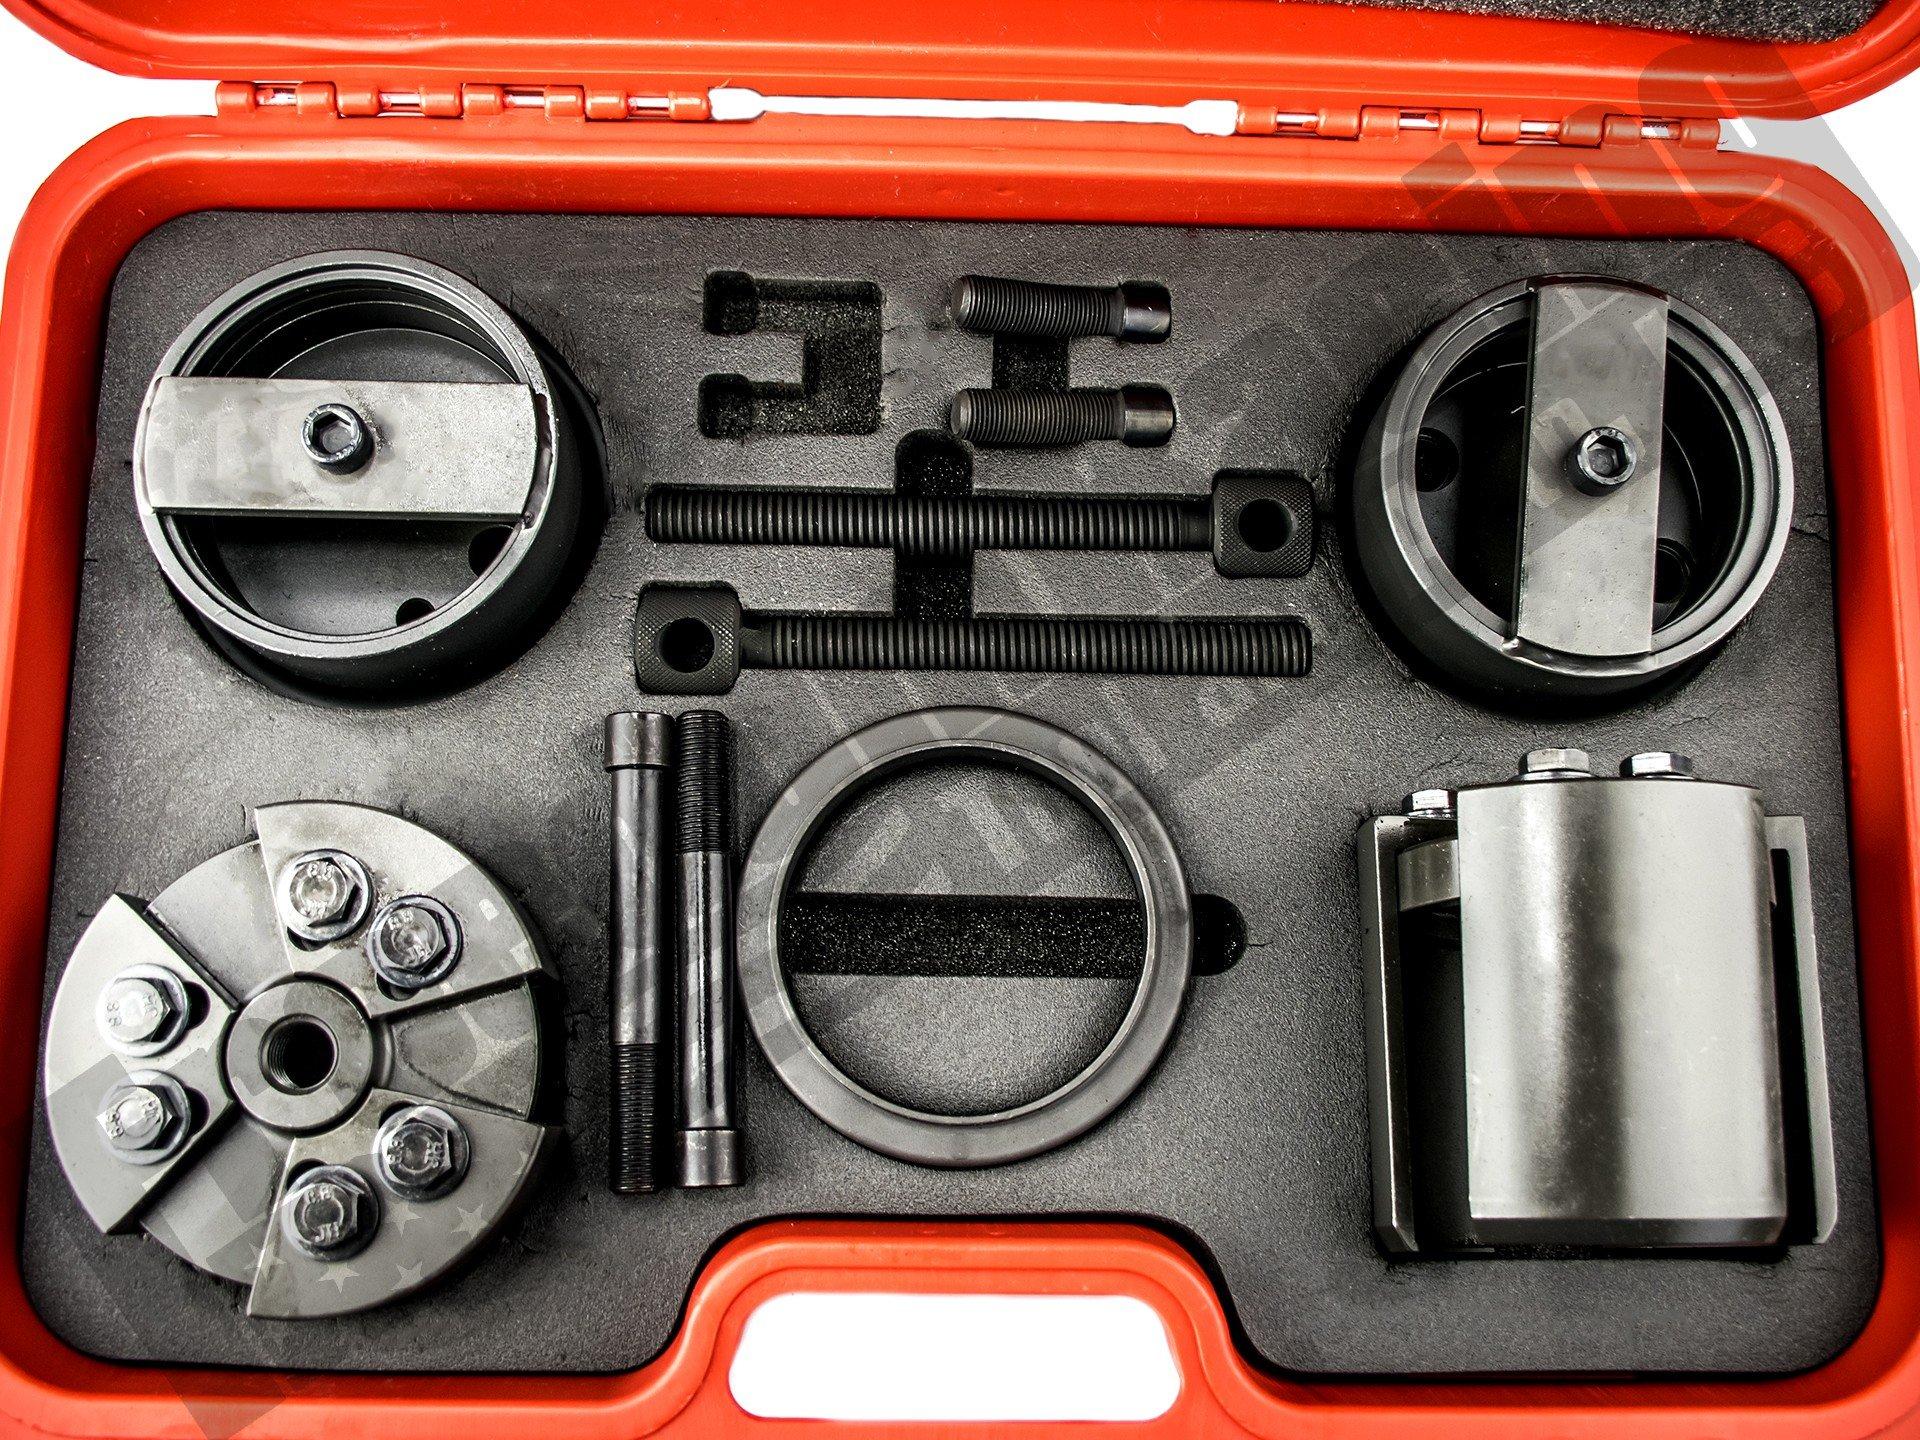 Am J 41221 A Kit Front Amp Rear Crankshaft Seal Installer Set